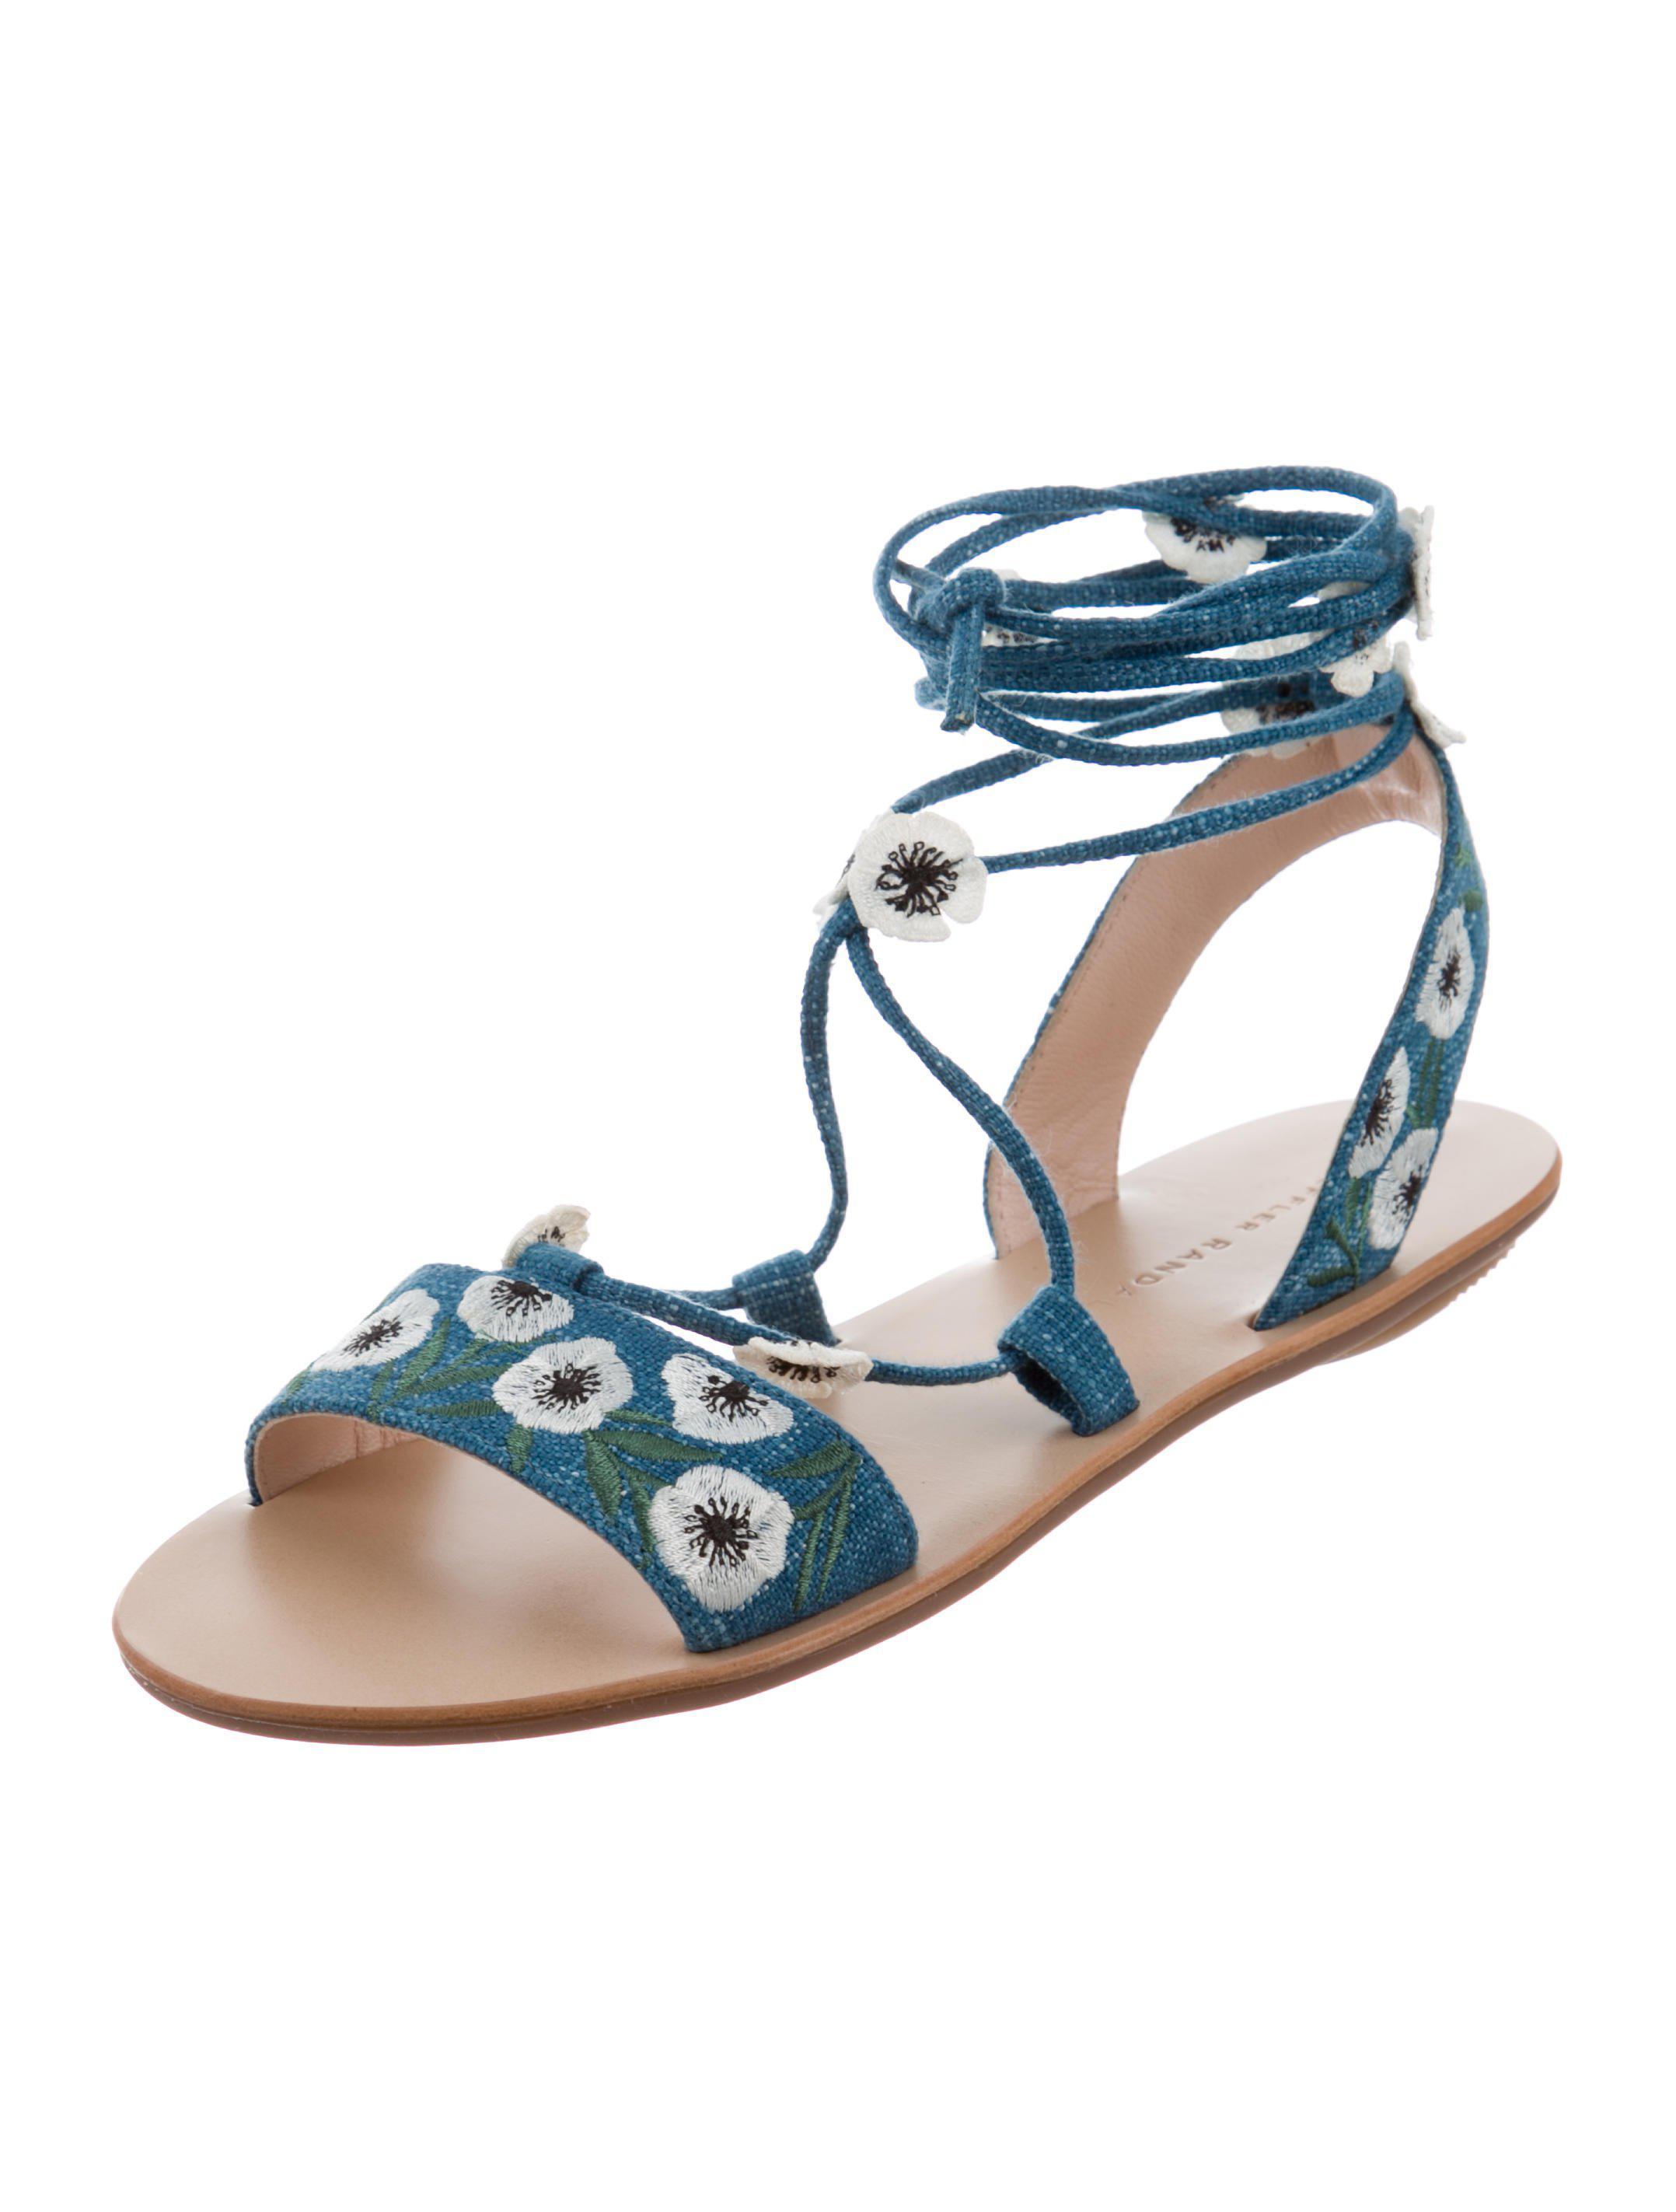 free shipping clearance best prices Loeffler Randall 2018 Fleura Sandals w/ Tags discount enjoy GdbU2GK7